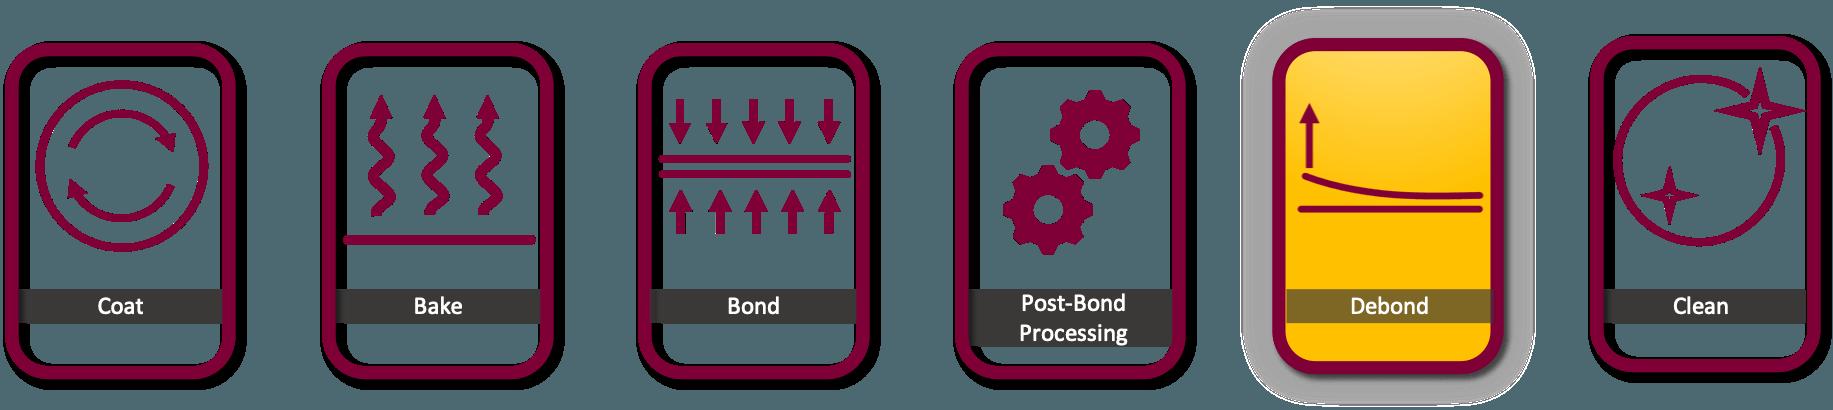 Cee Apogee Wafer Bond Debond Mount Demount Process Flow